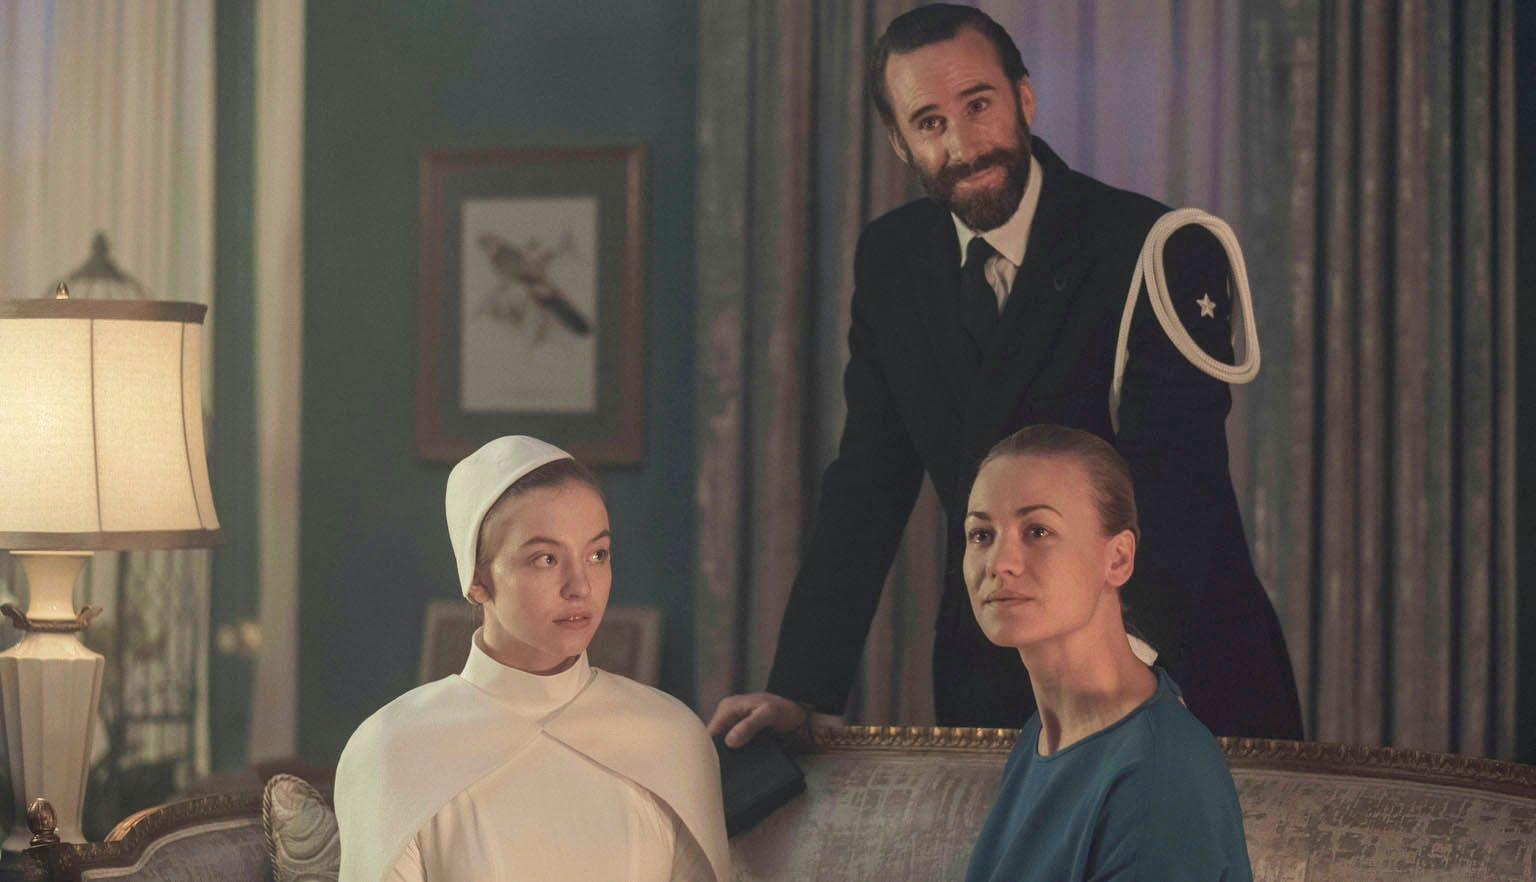 The Handmaid's Tale' Season 2 Recaps: Episodes 1-13 - PureWow